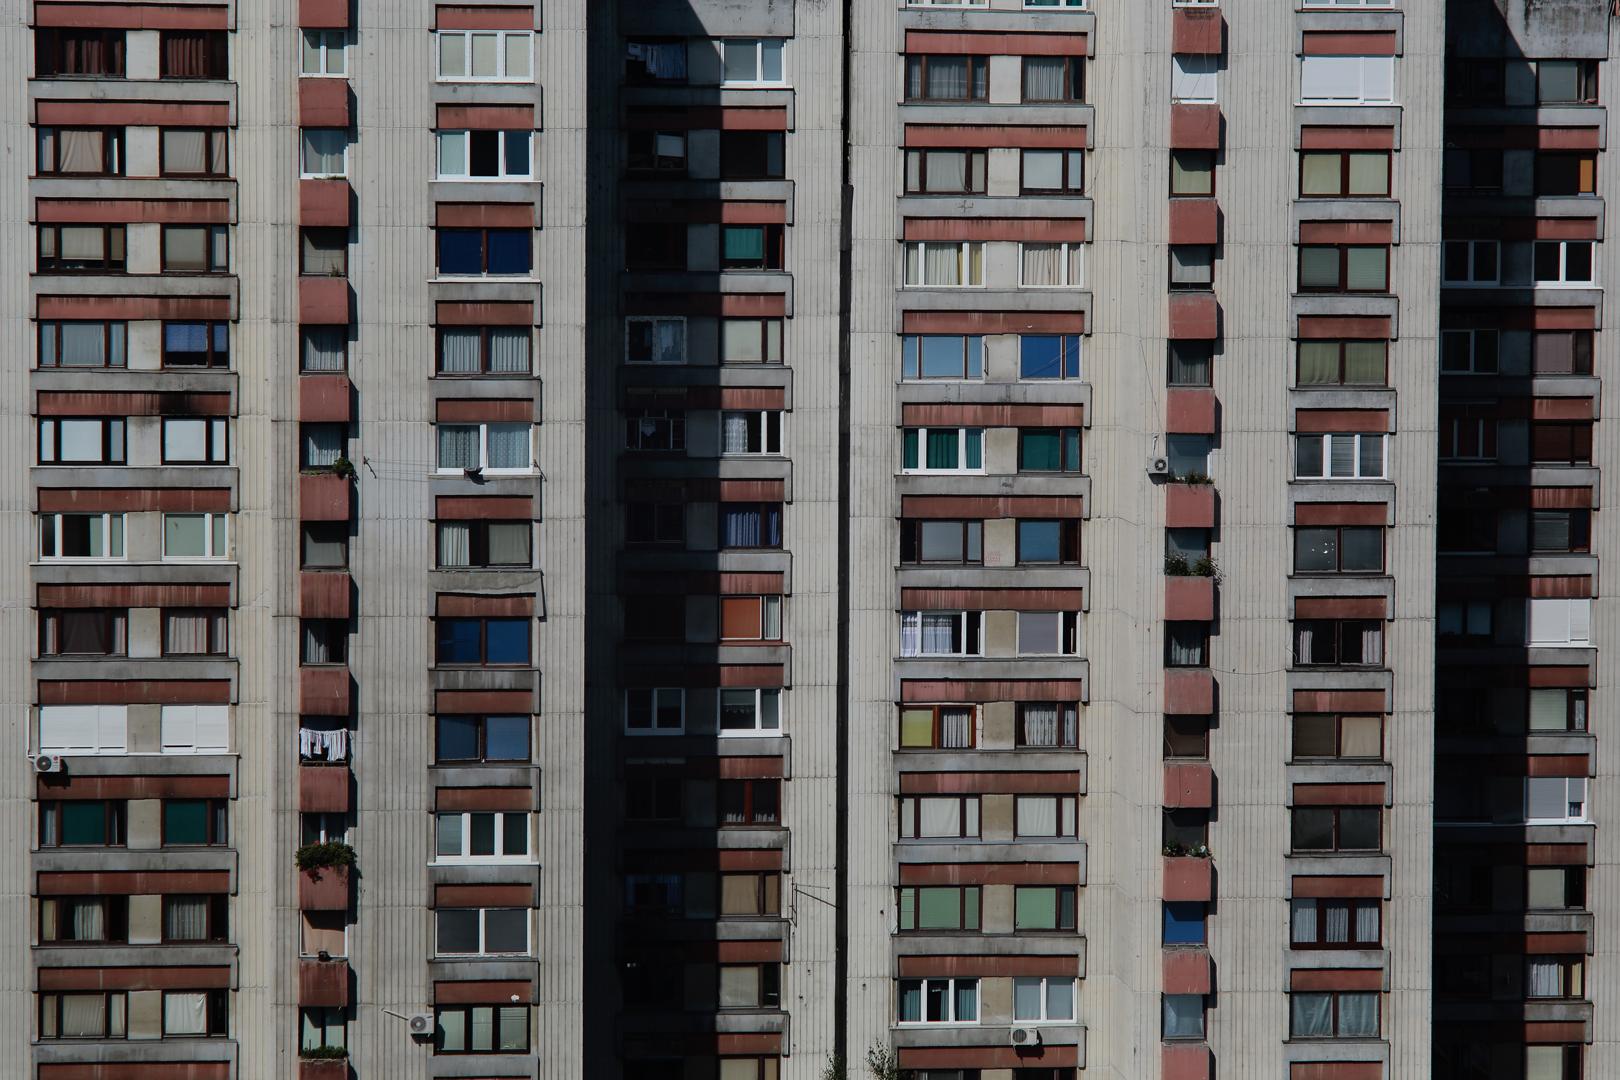 ©, Zinka Bejtic, Displacement